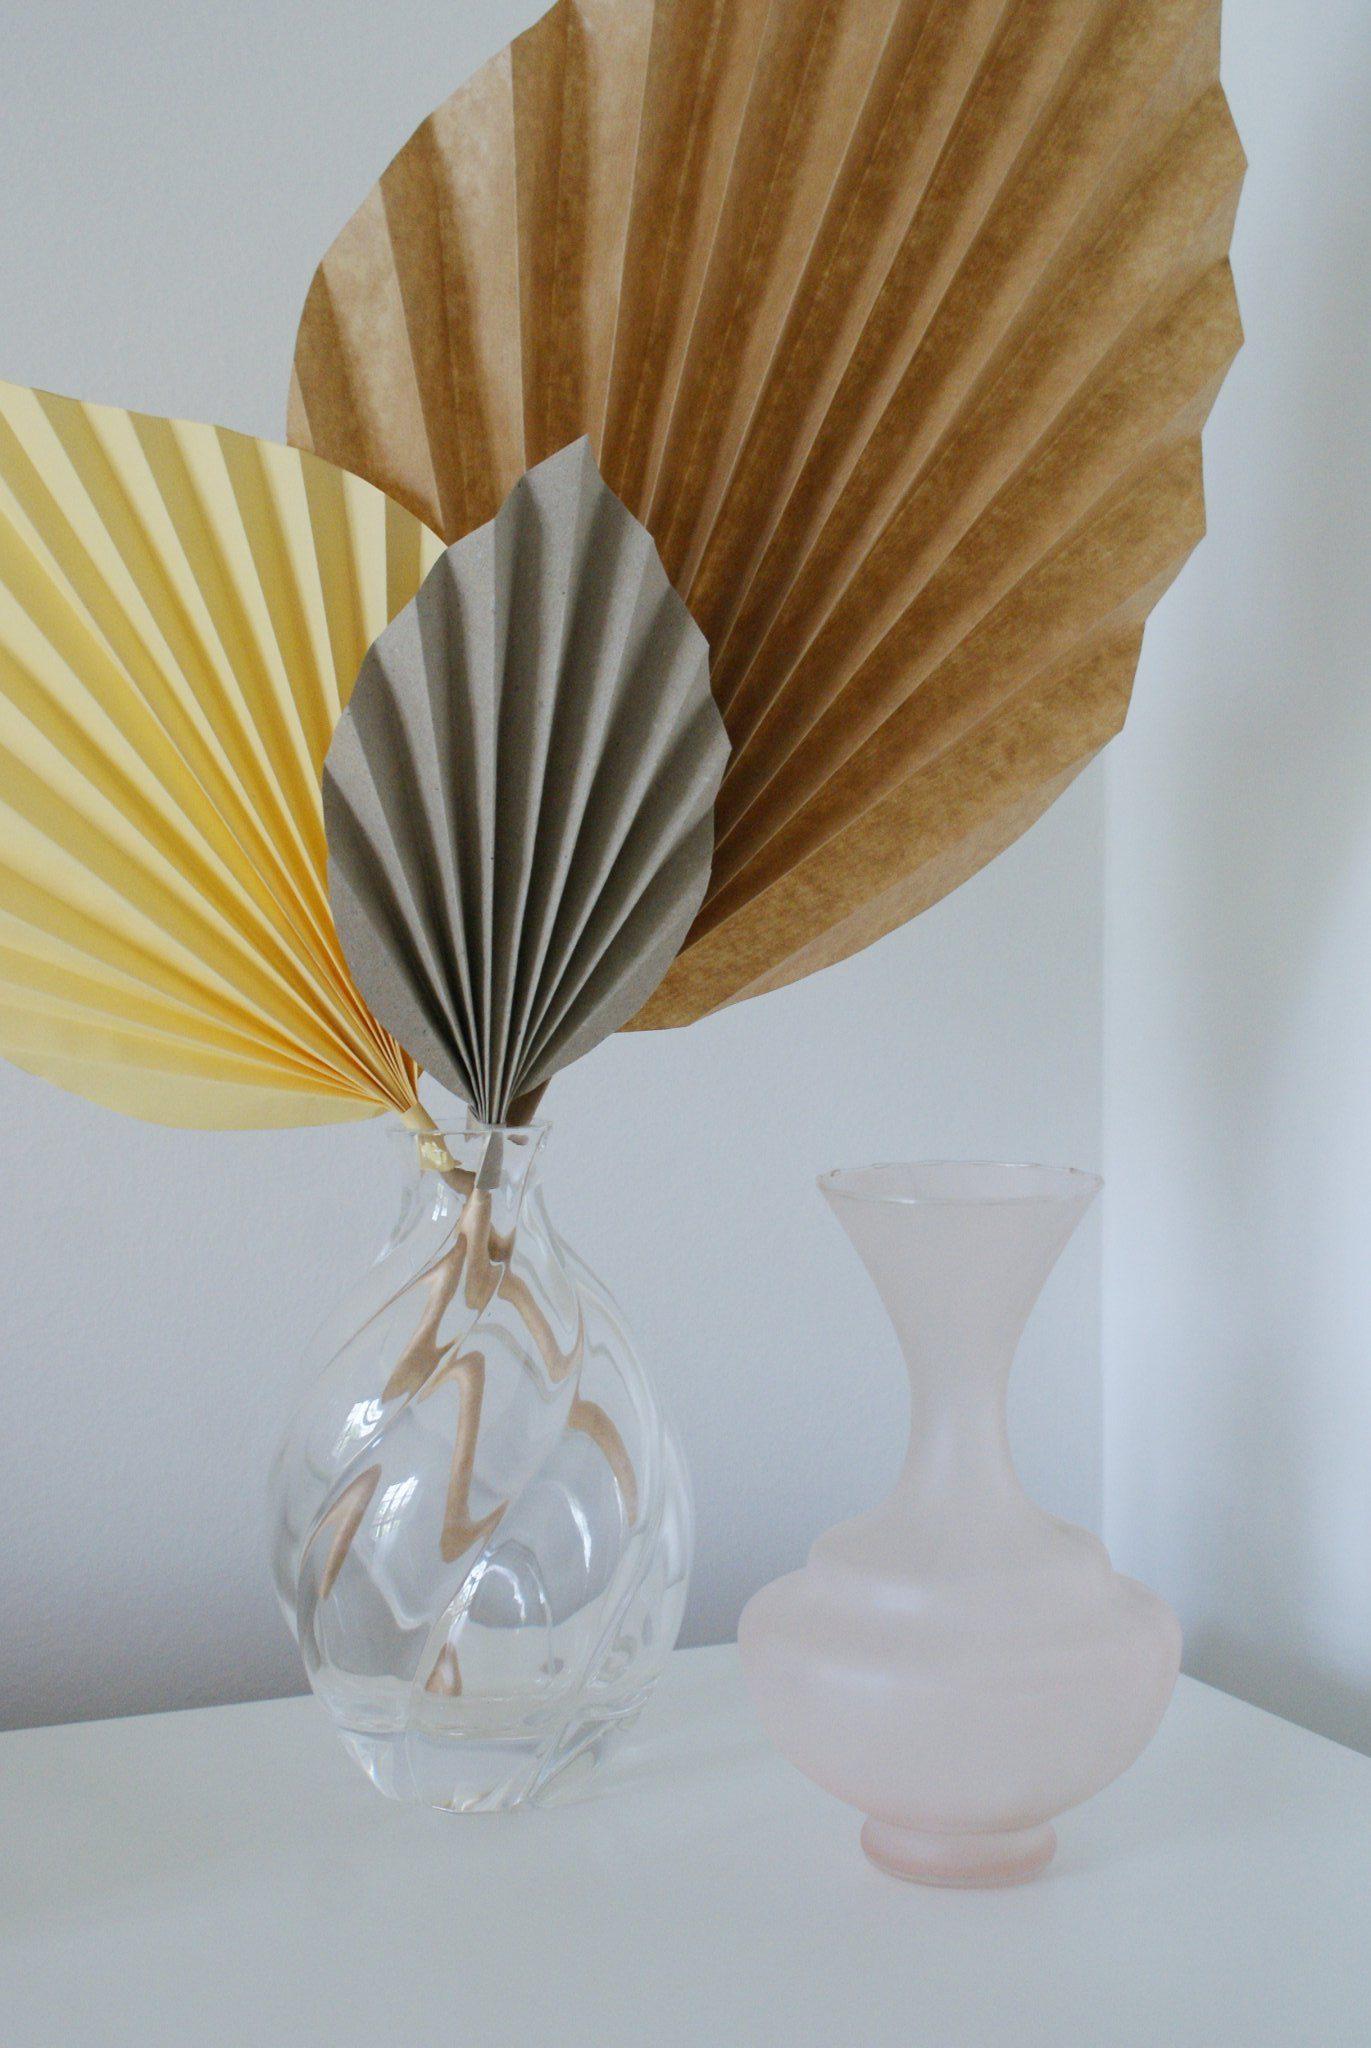 diy palm paper leaf leaves decor idea handmade craft easy simple tutorial home decoration neutral minimalist francinesplaceblog 2